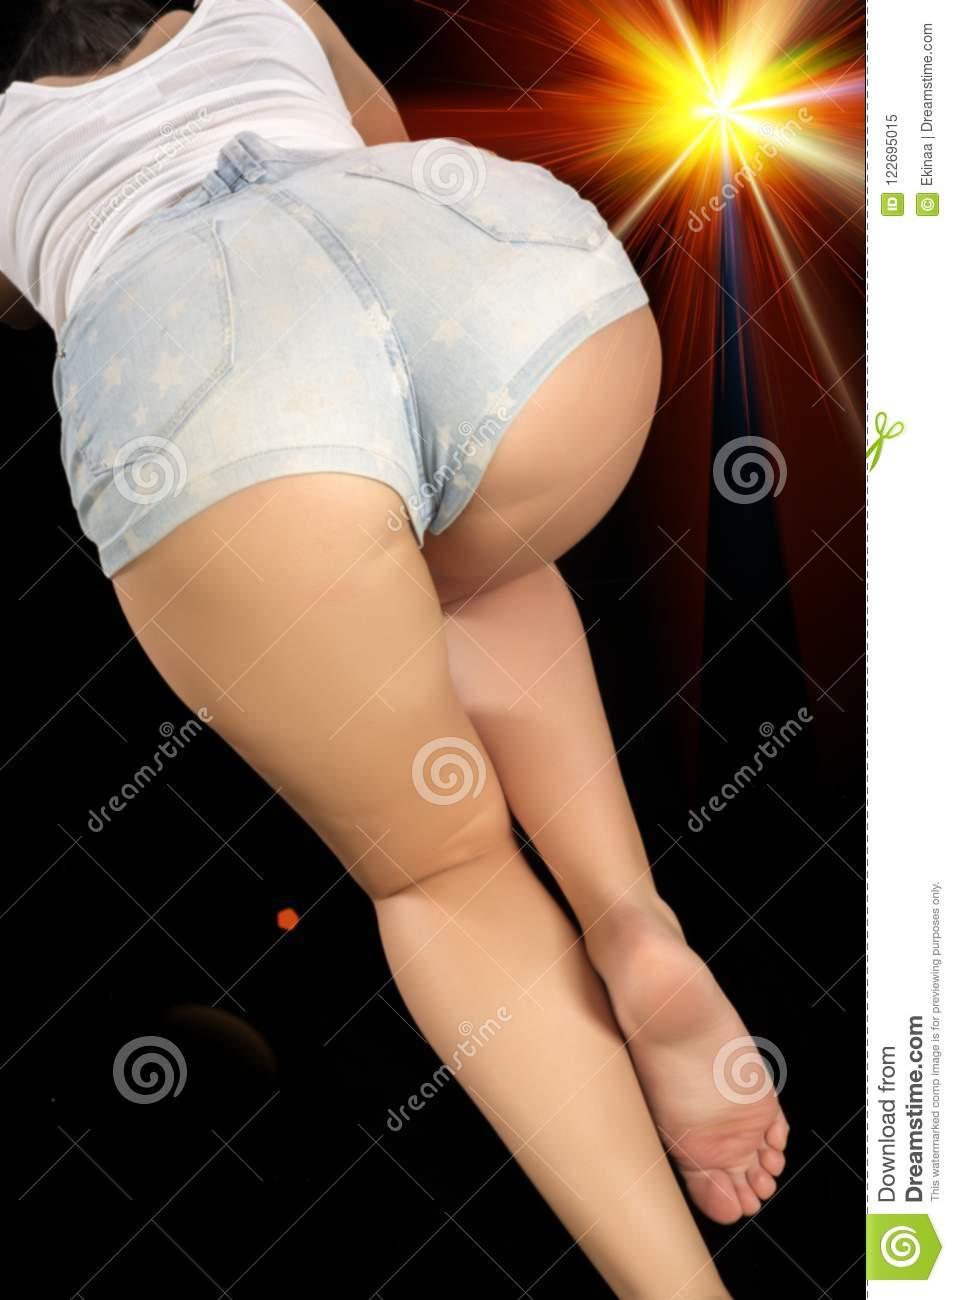 Naked teen girls humping gif lesbian